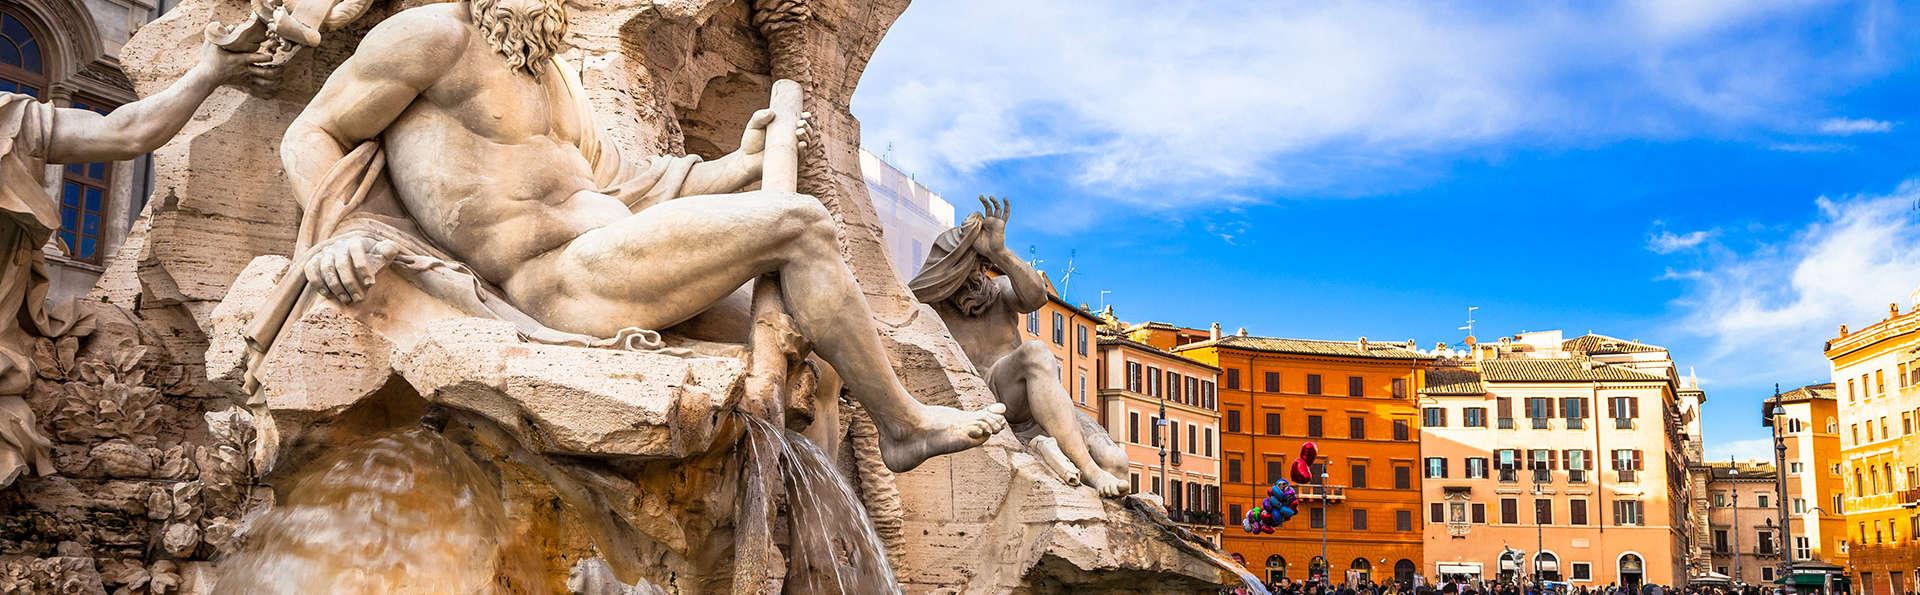 Rome Art Hotel - EDIT_DESTINATION_01.jpg